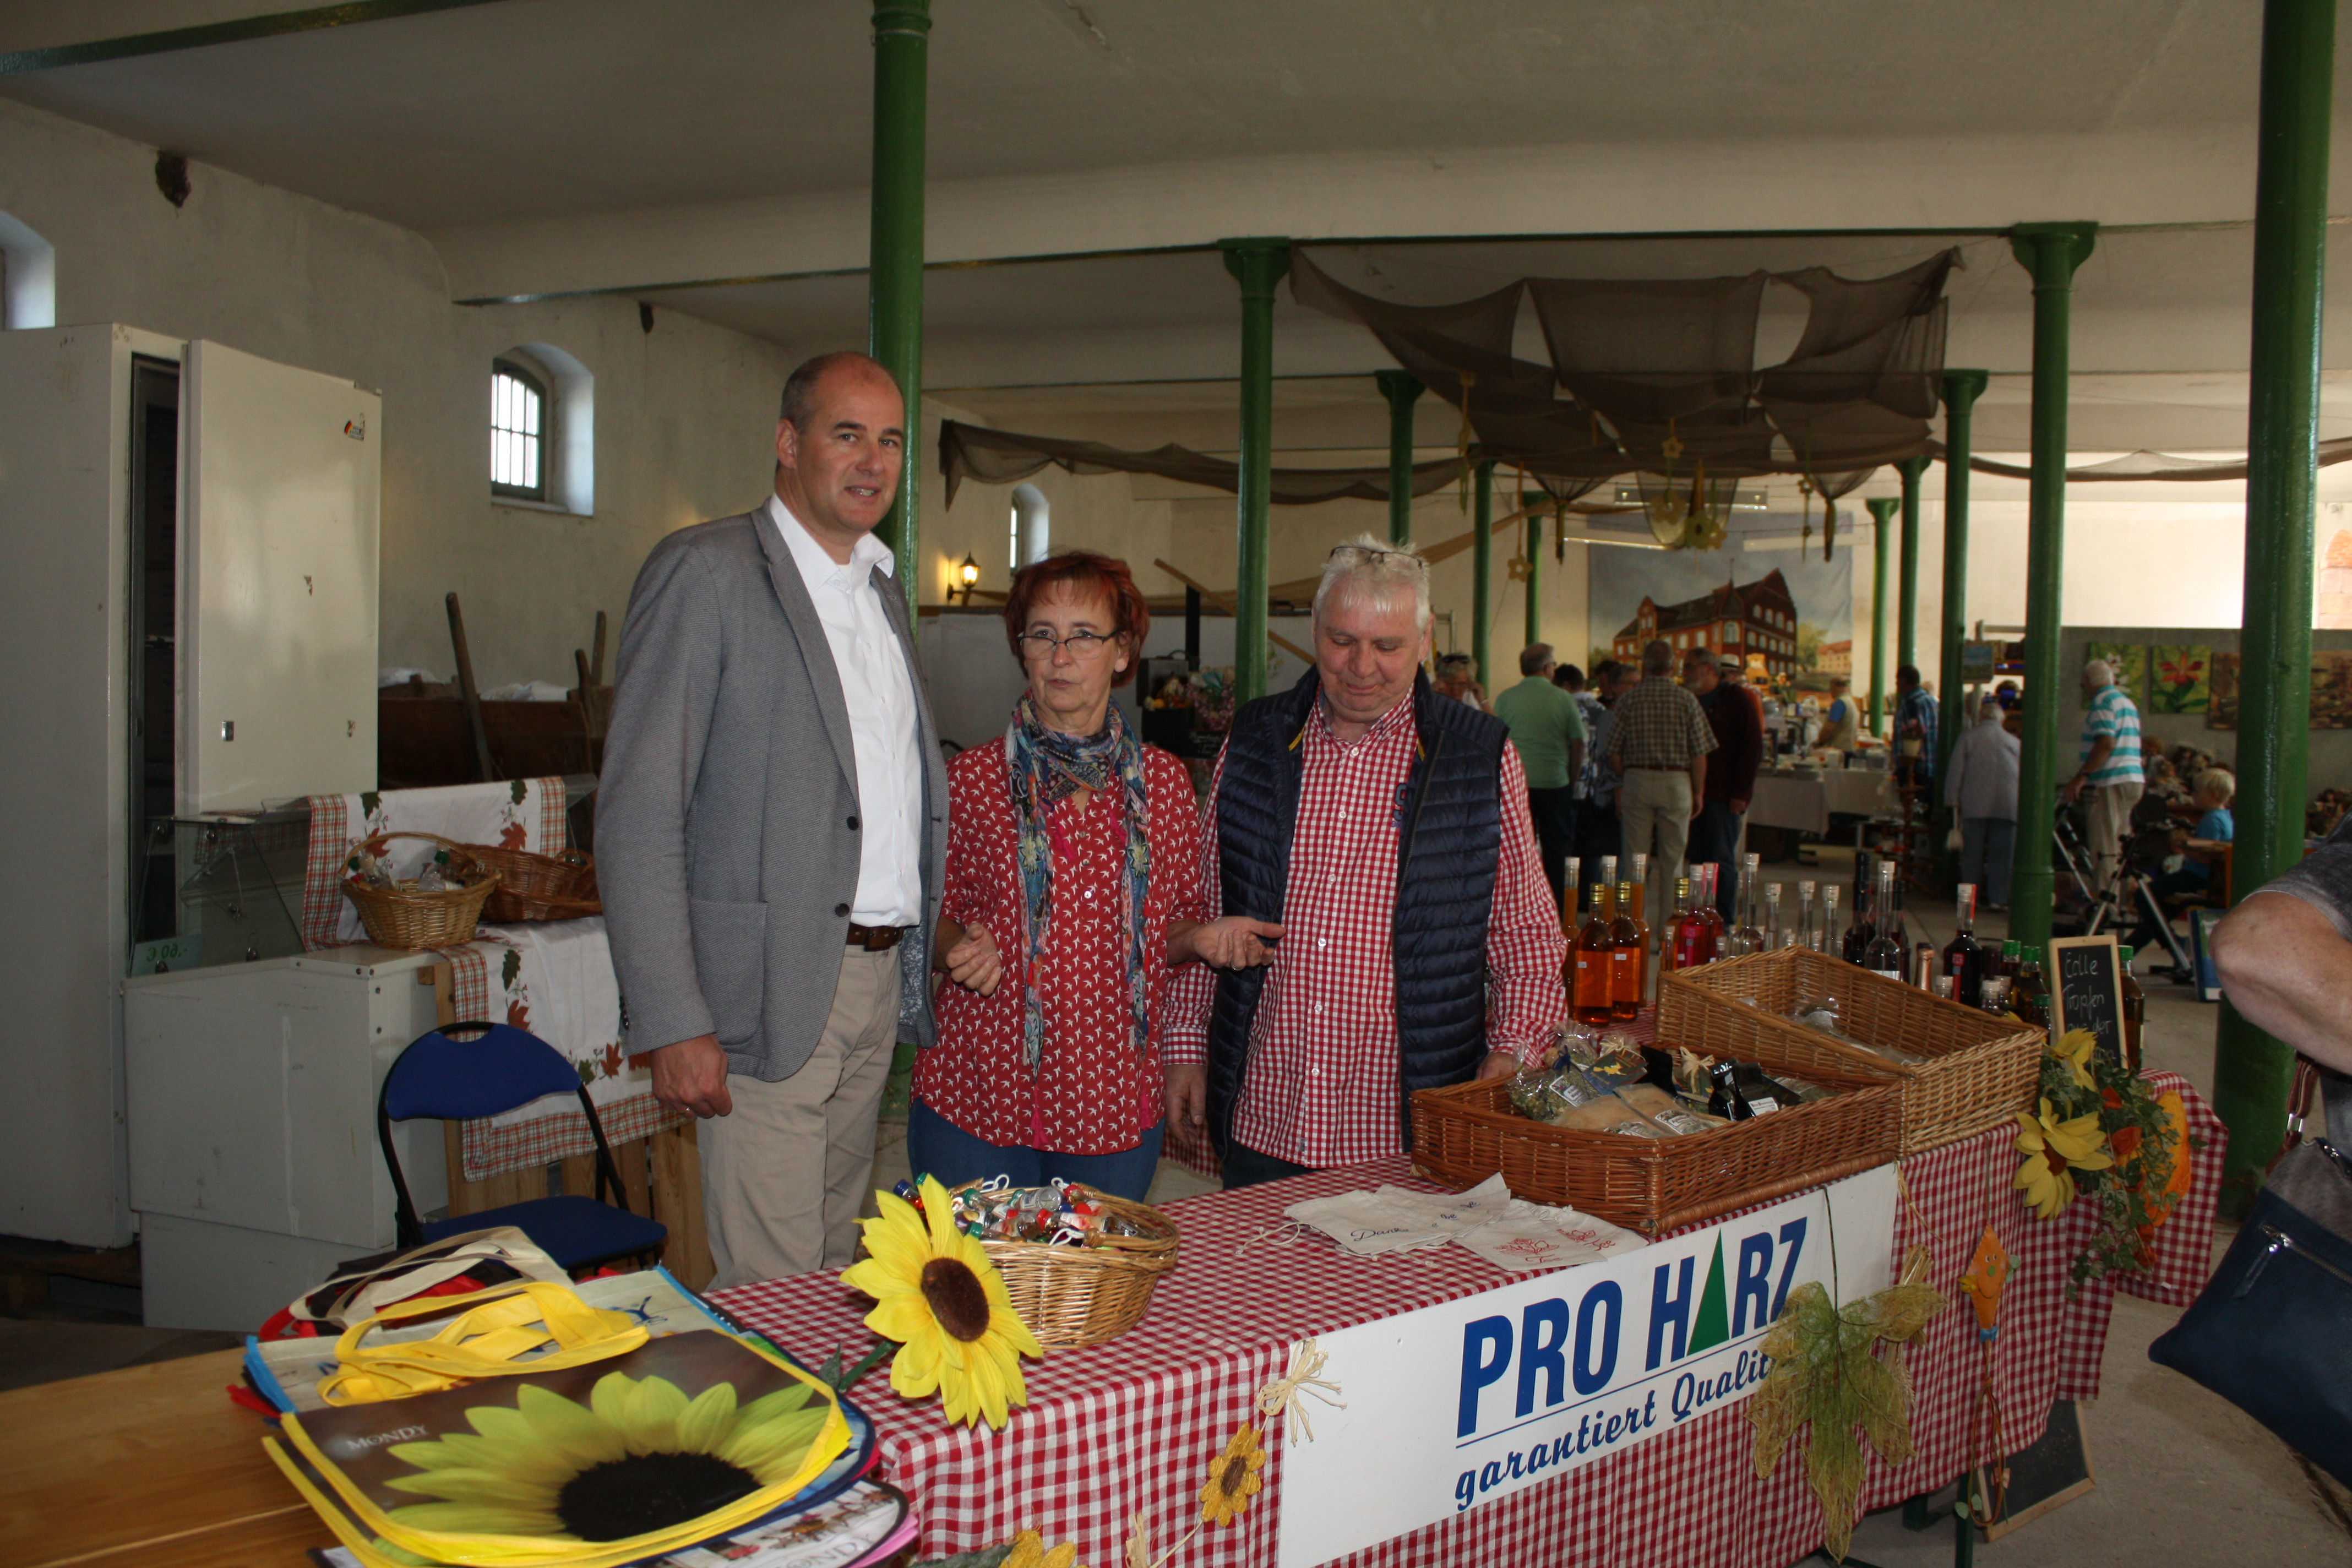 Unser Projektpartner in Sachsen-Anhalt, die Fam. Kirchner von der Posthalterei Stolberg.JPG